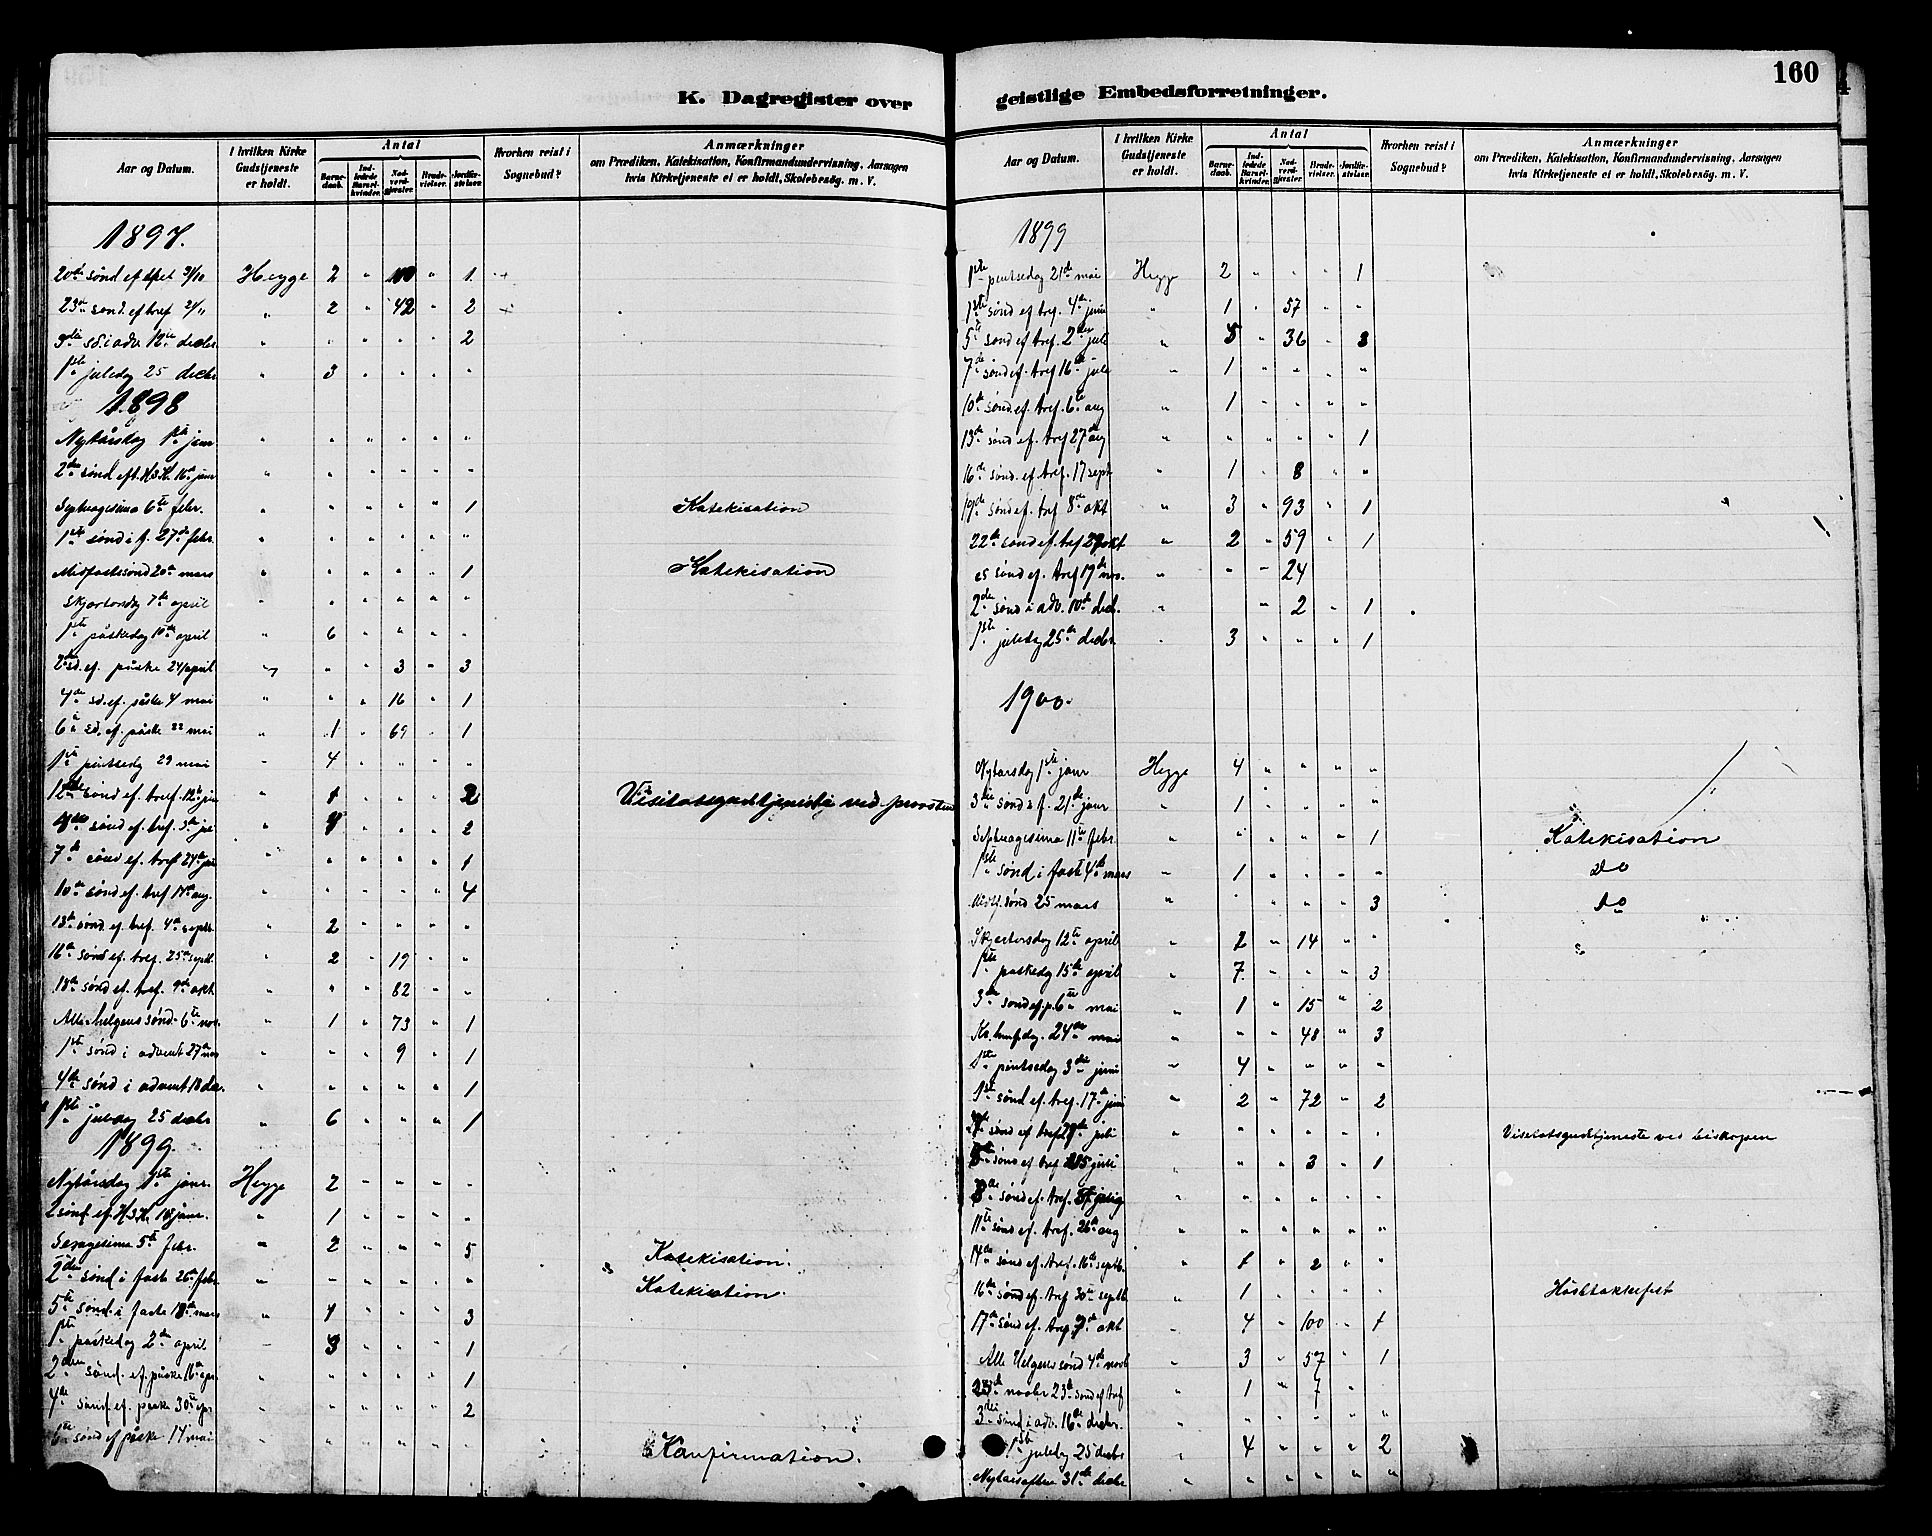 SAH, Øystre Slidre prestekontor, Klokkerbok nr. 4, 1887-1907, s. 160